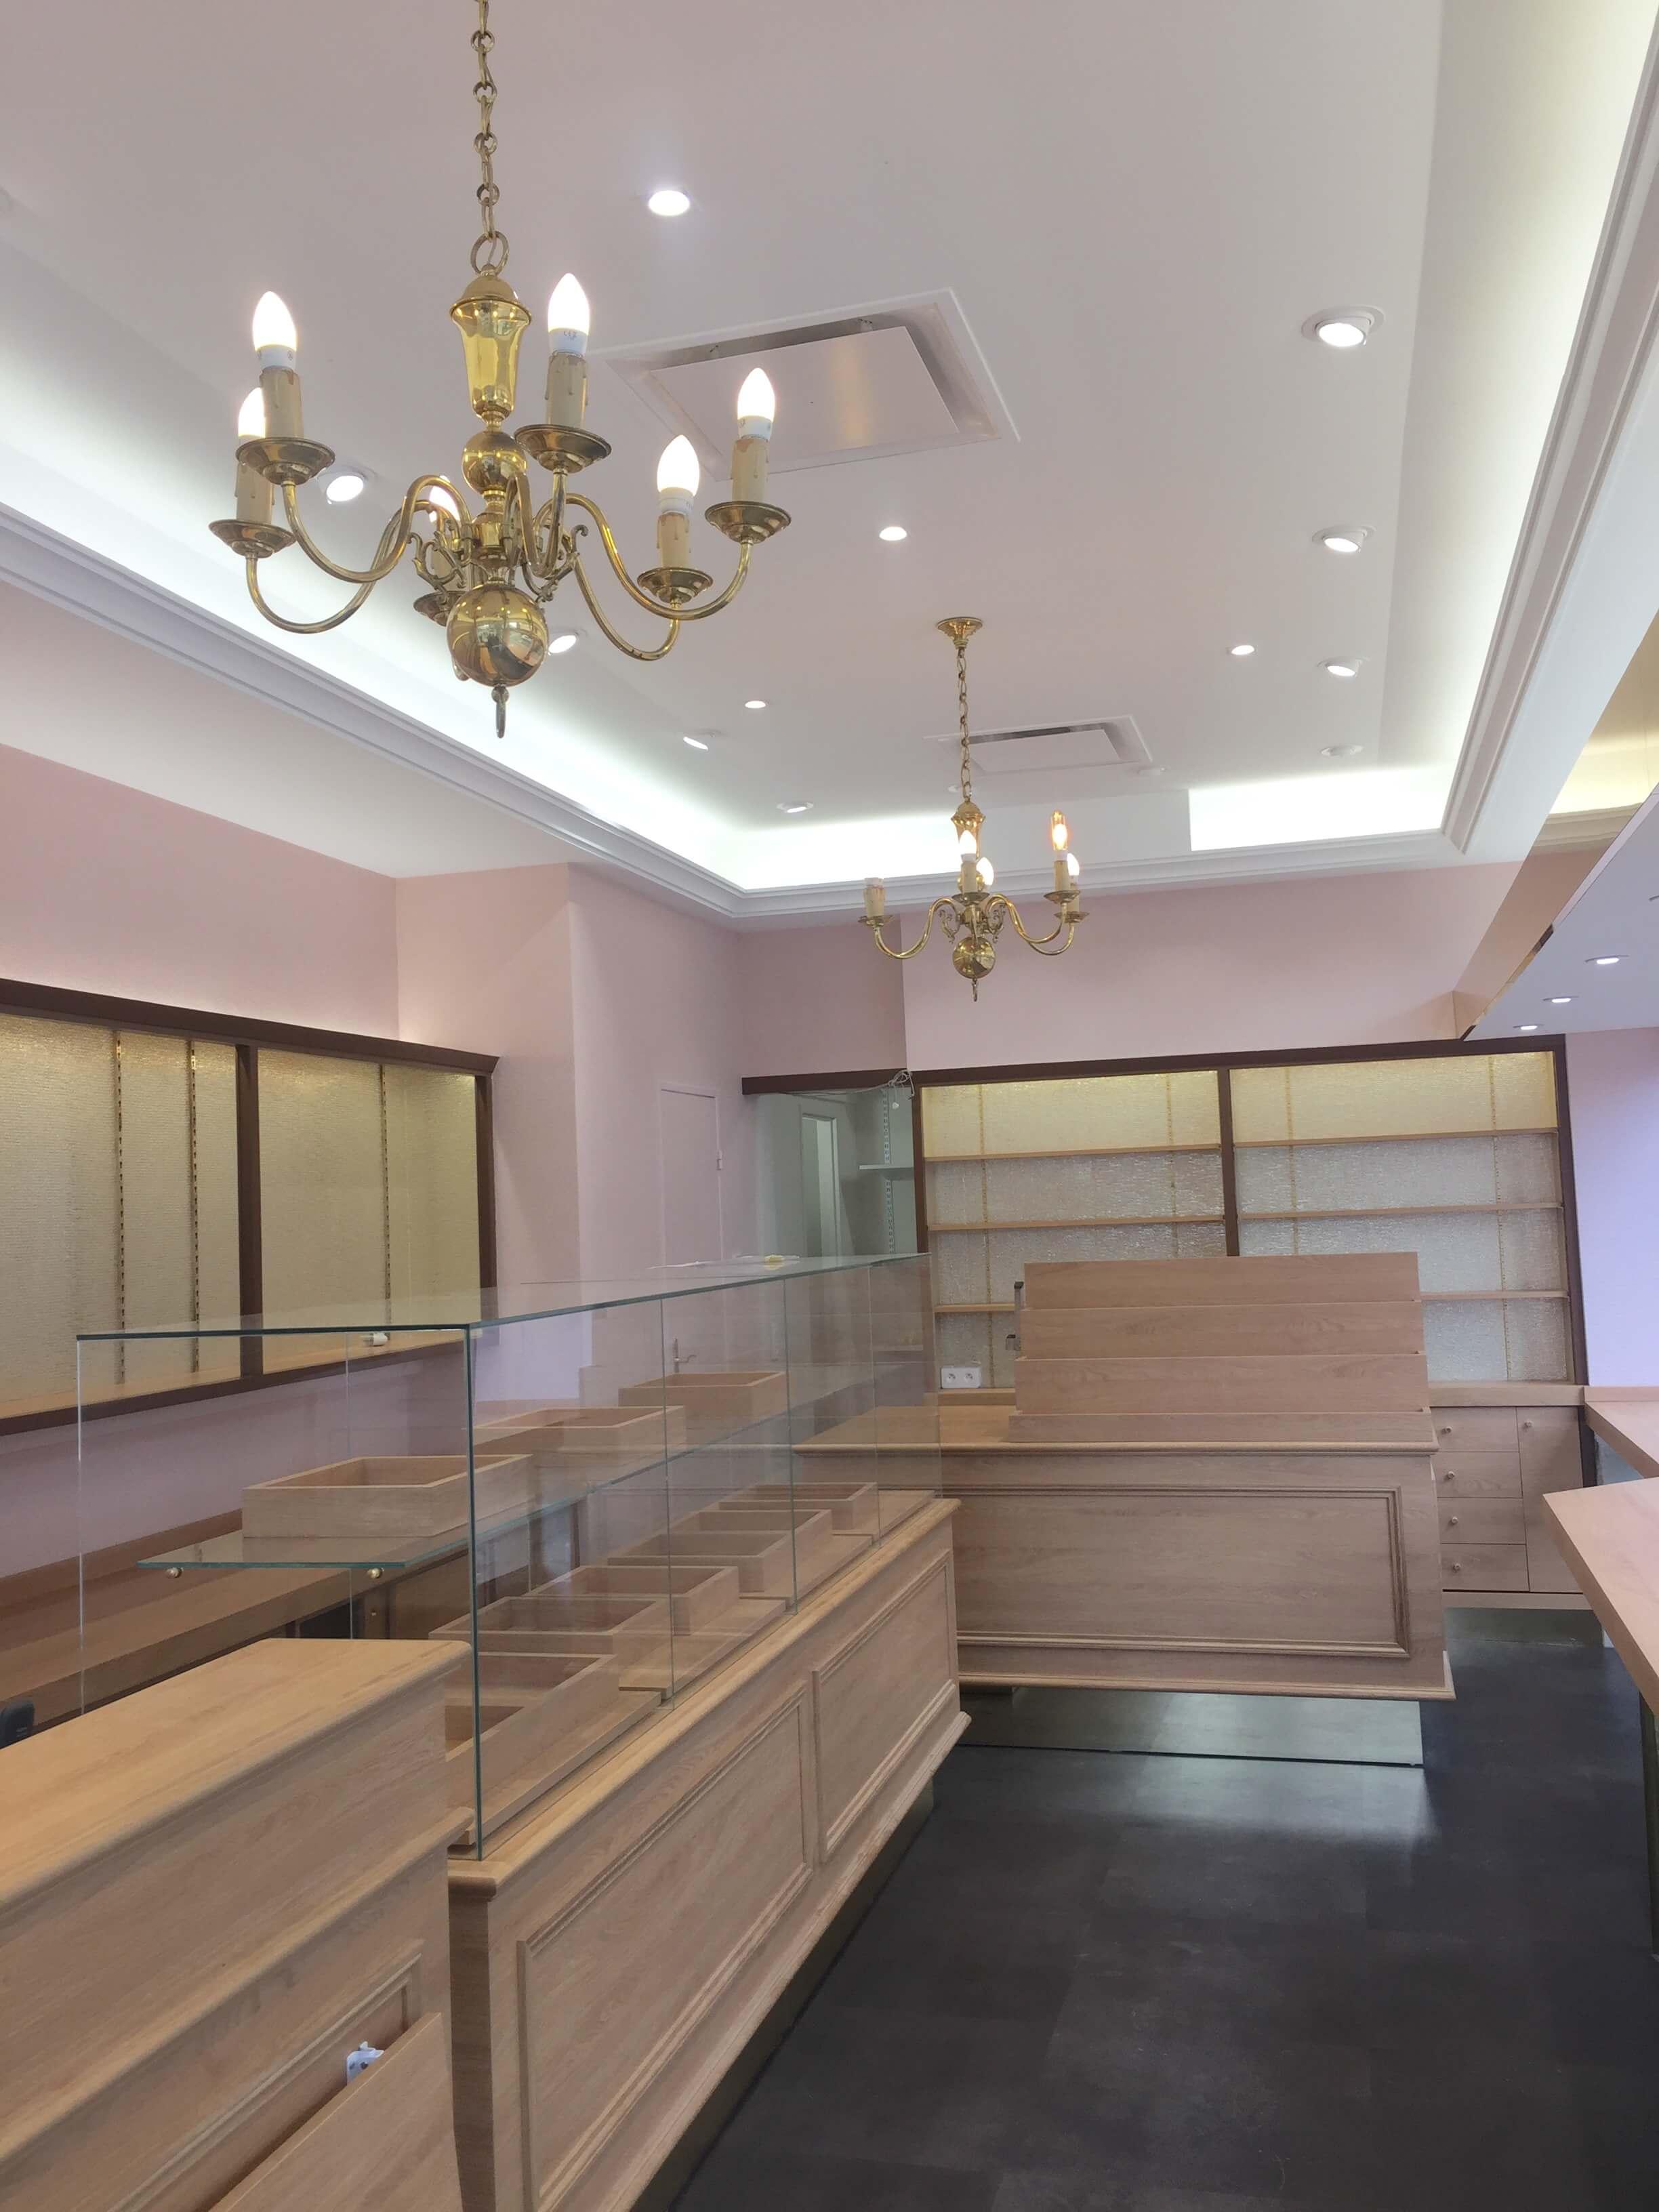 dimitri-danger-architecte-interieur-chocolaterie-caen03